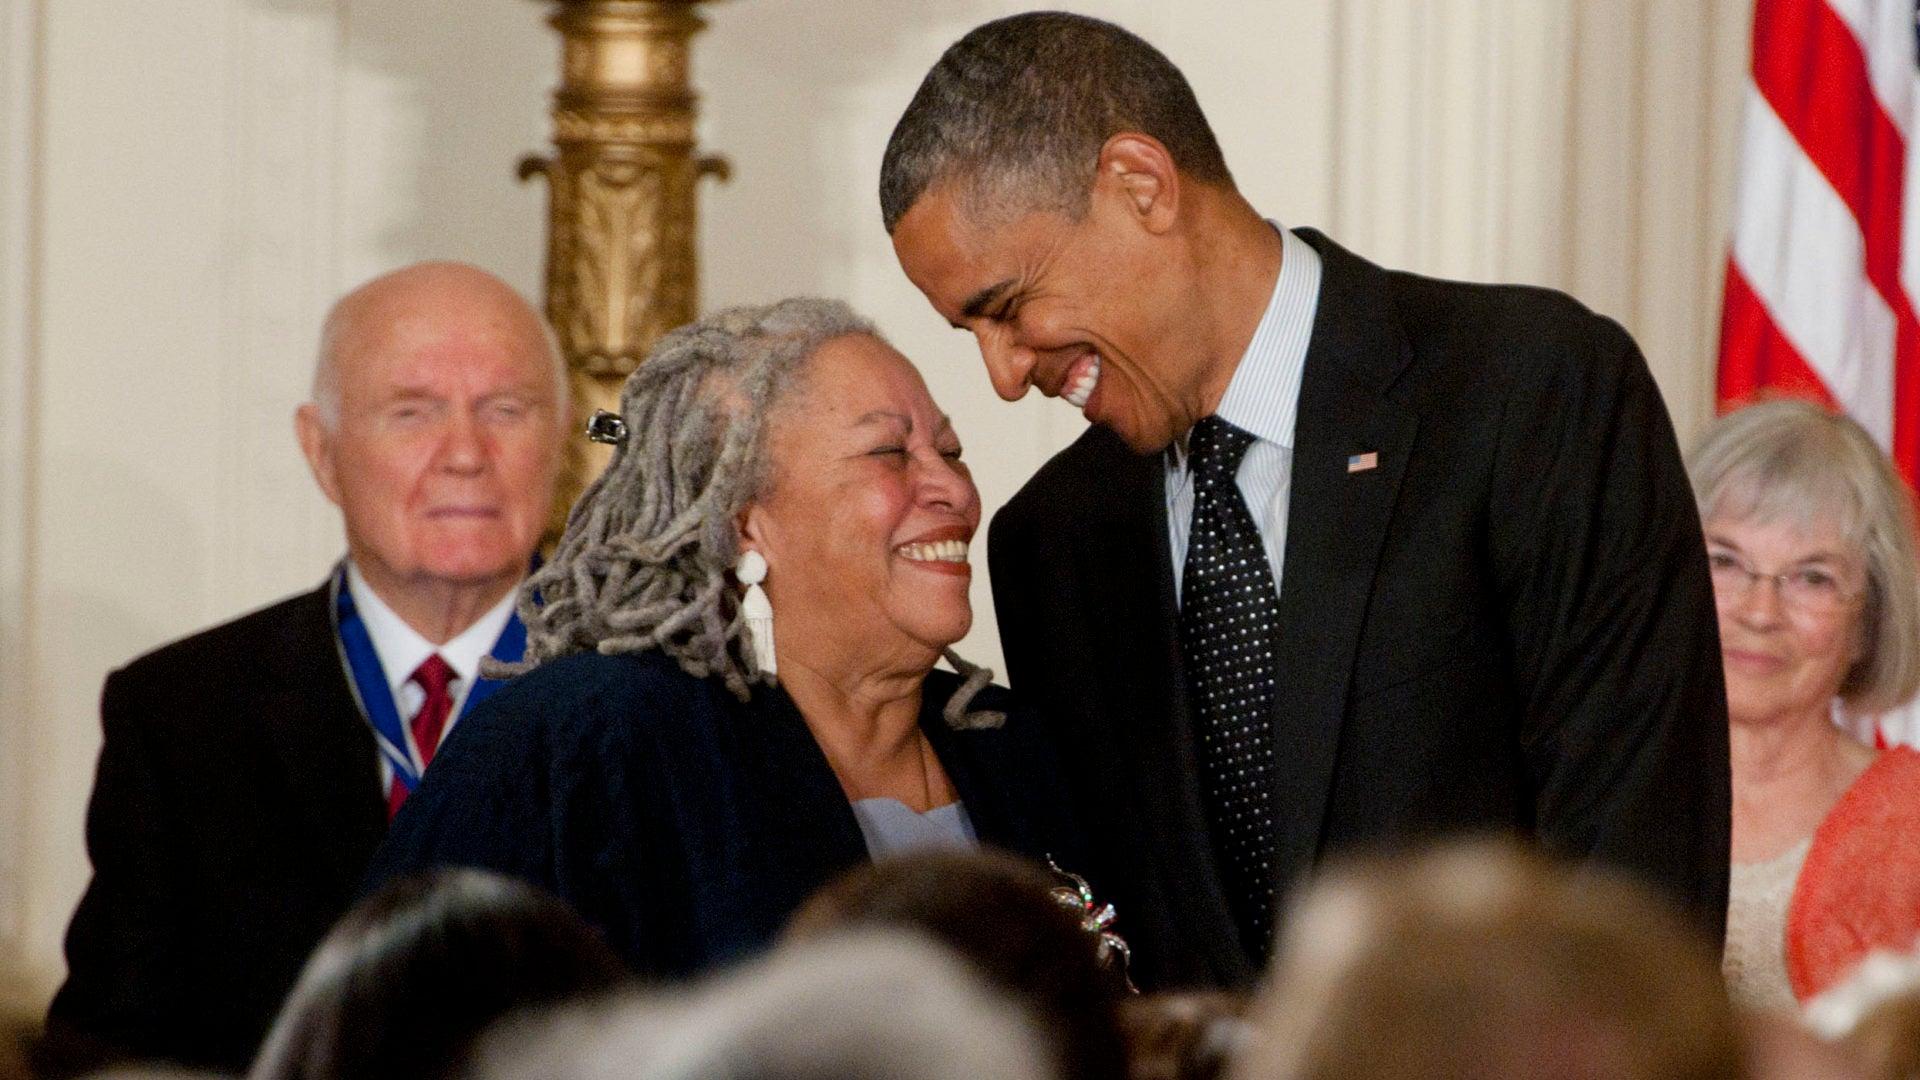 These Toni Morrison Books Topped Barack Obama's Summer Reading List